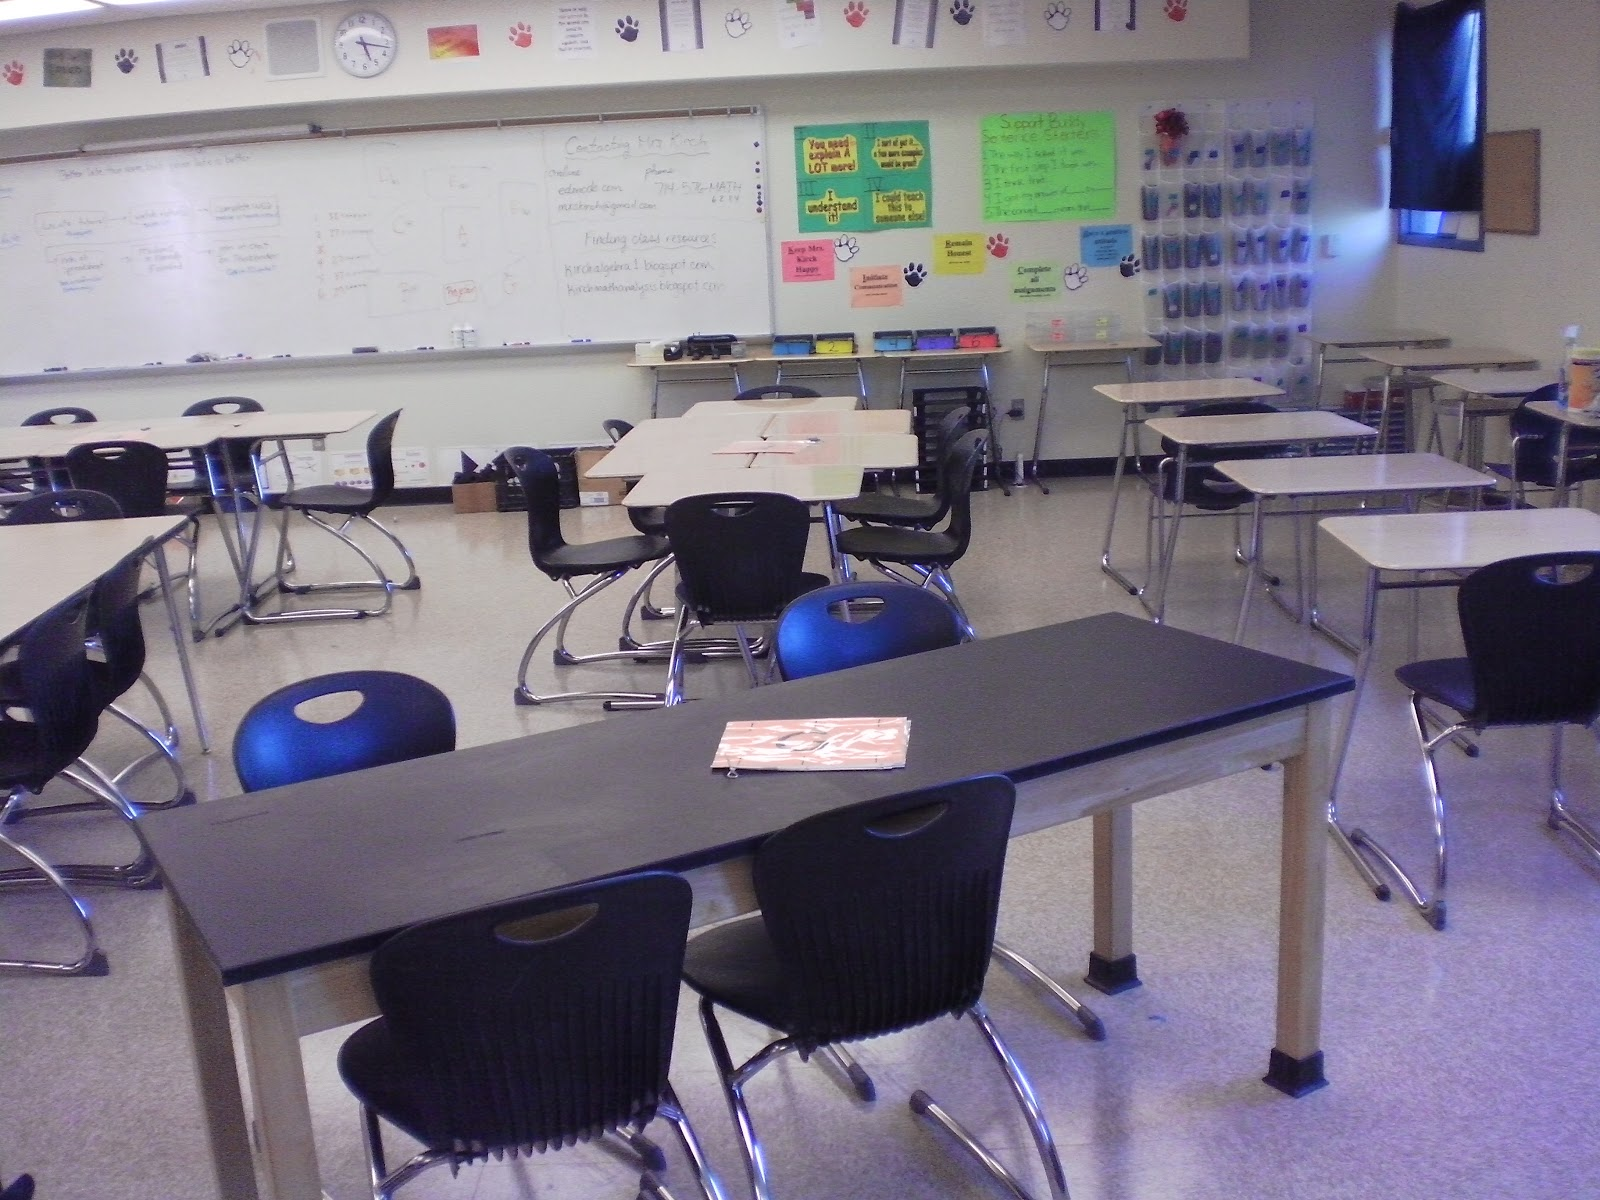 desks in rows on side for quiz retaking